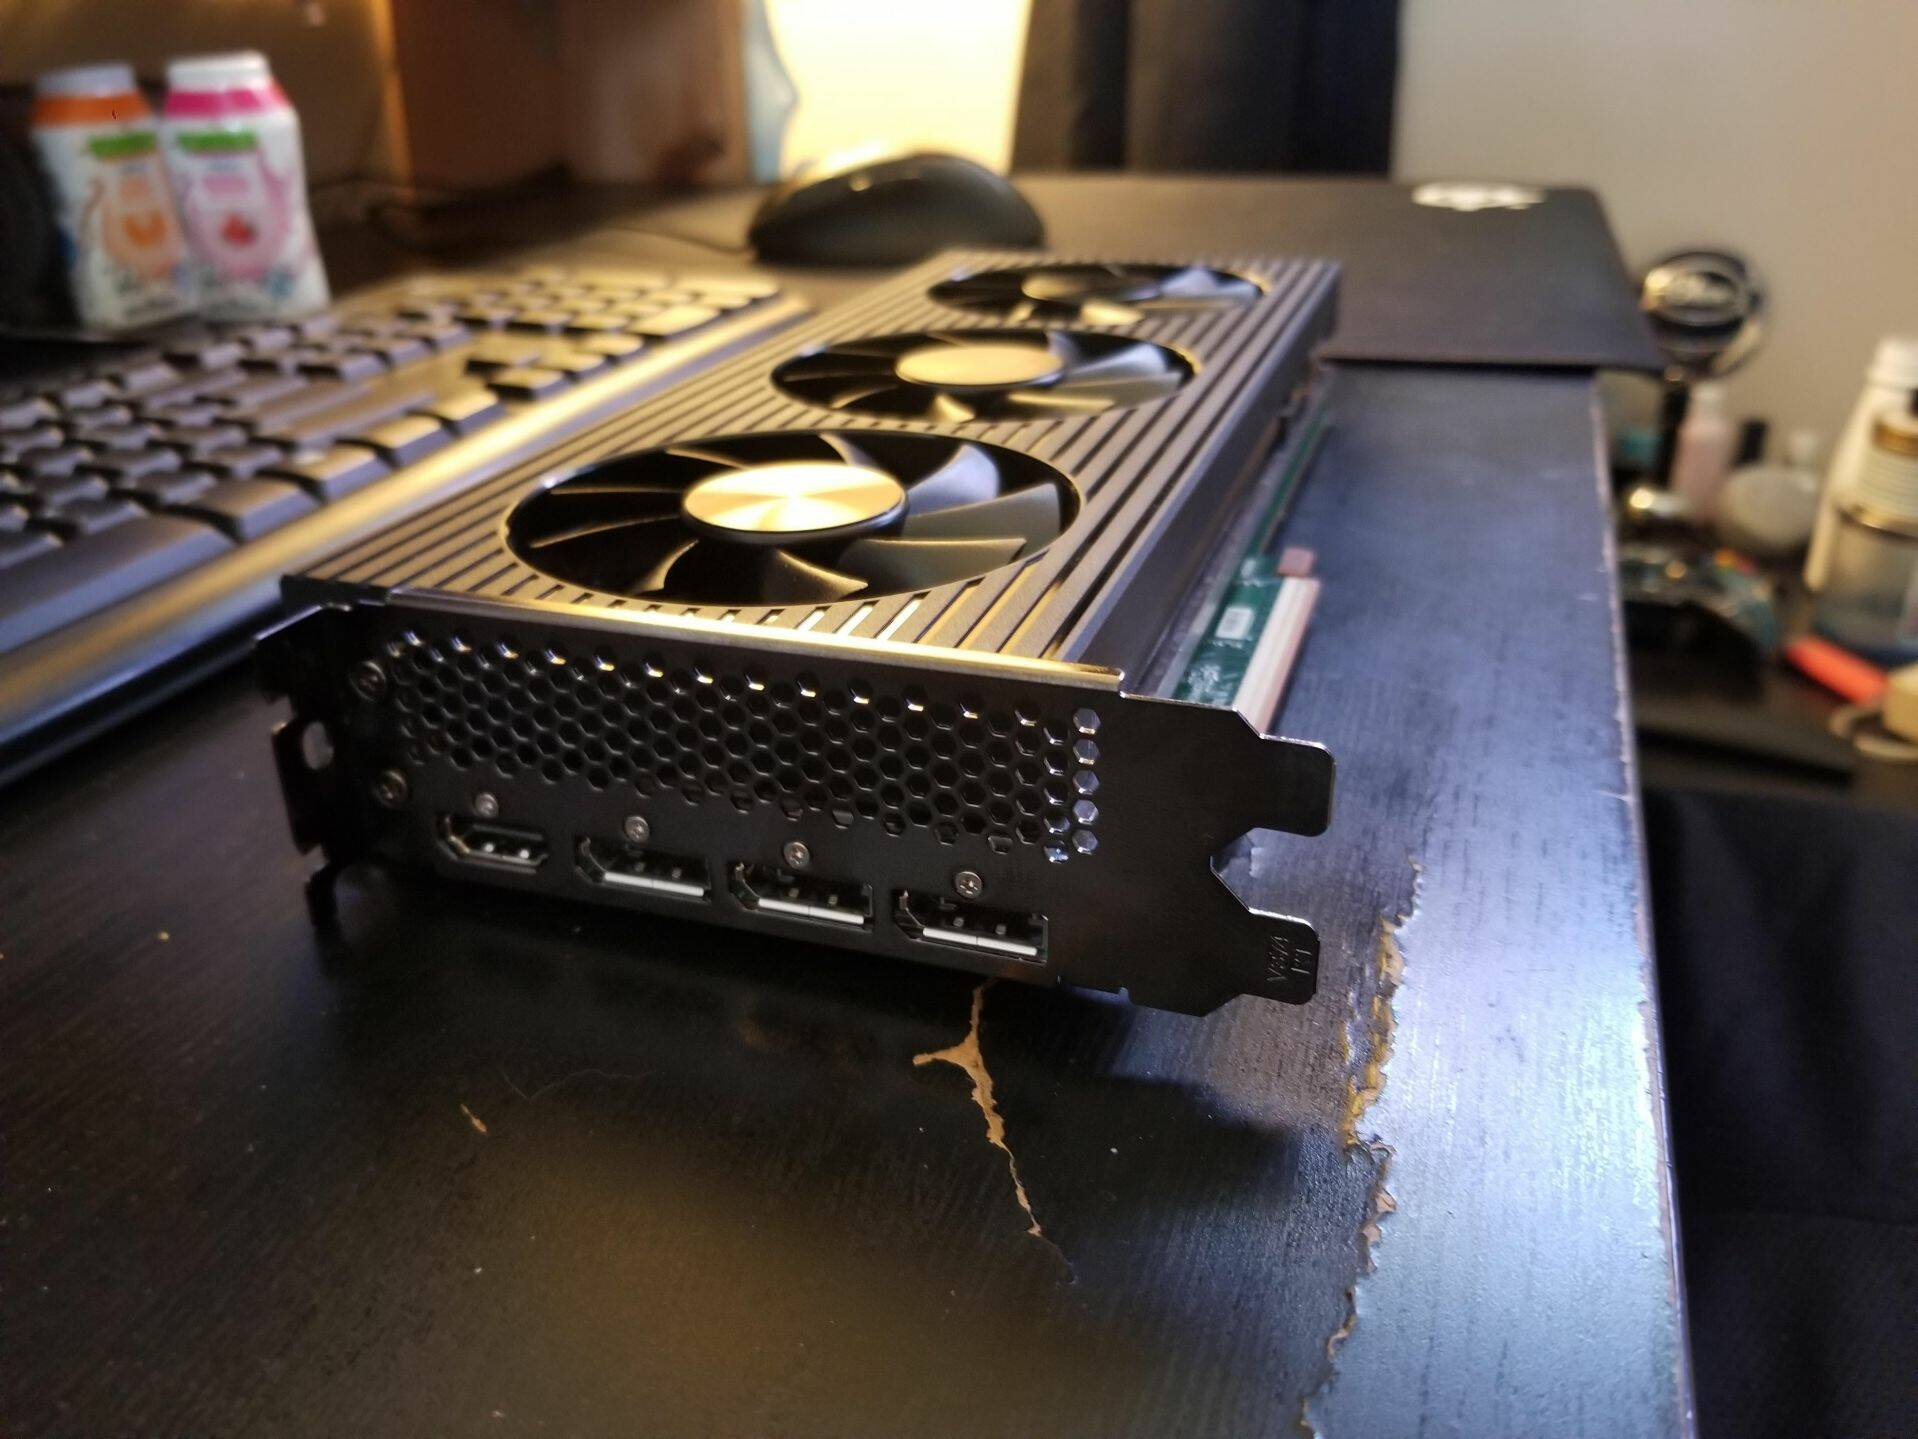 Dell Radeon RX 6800 XT